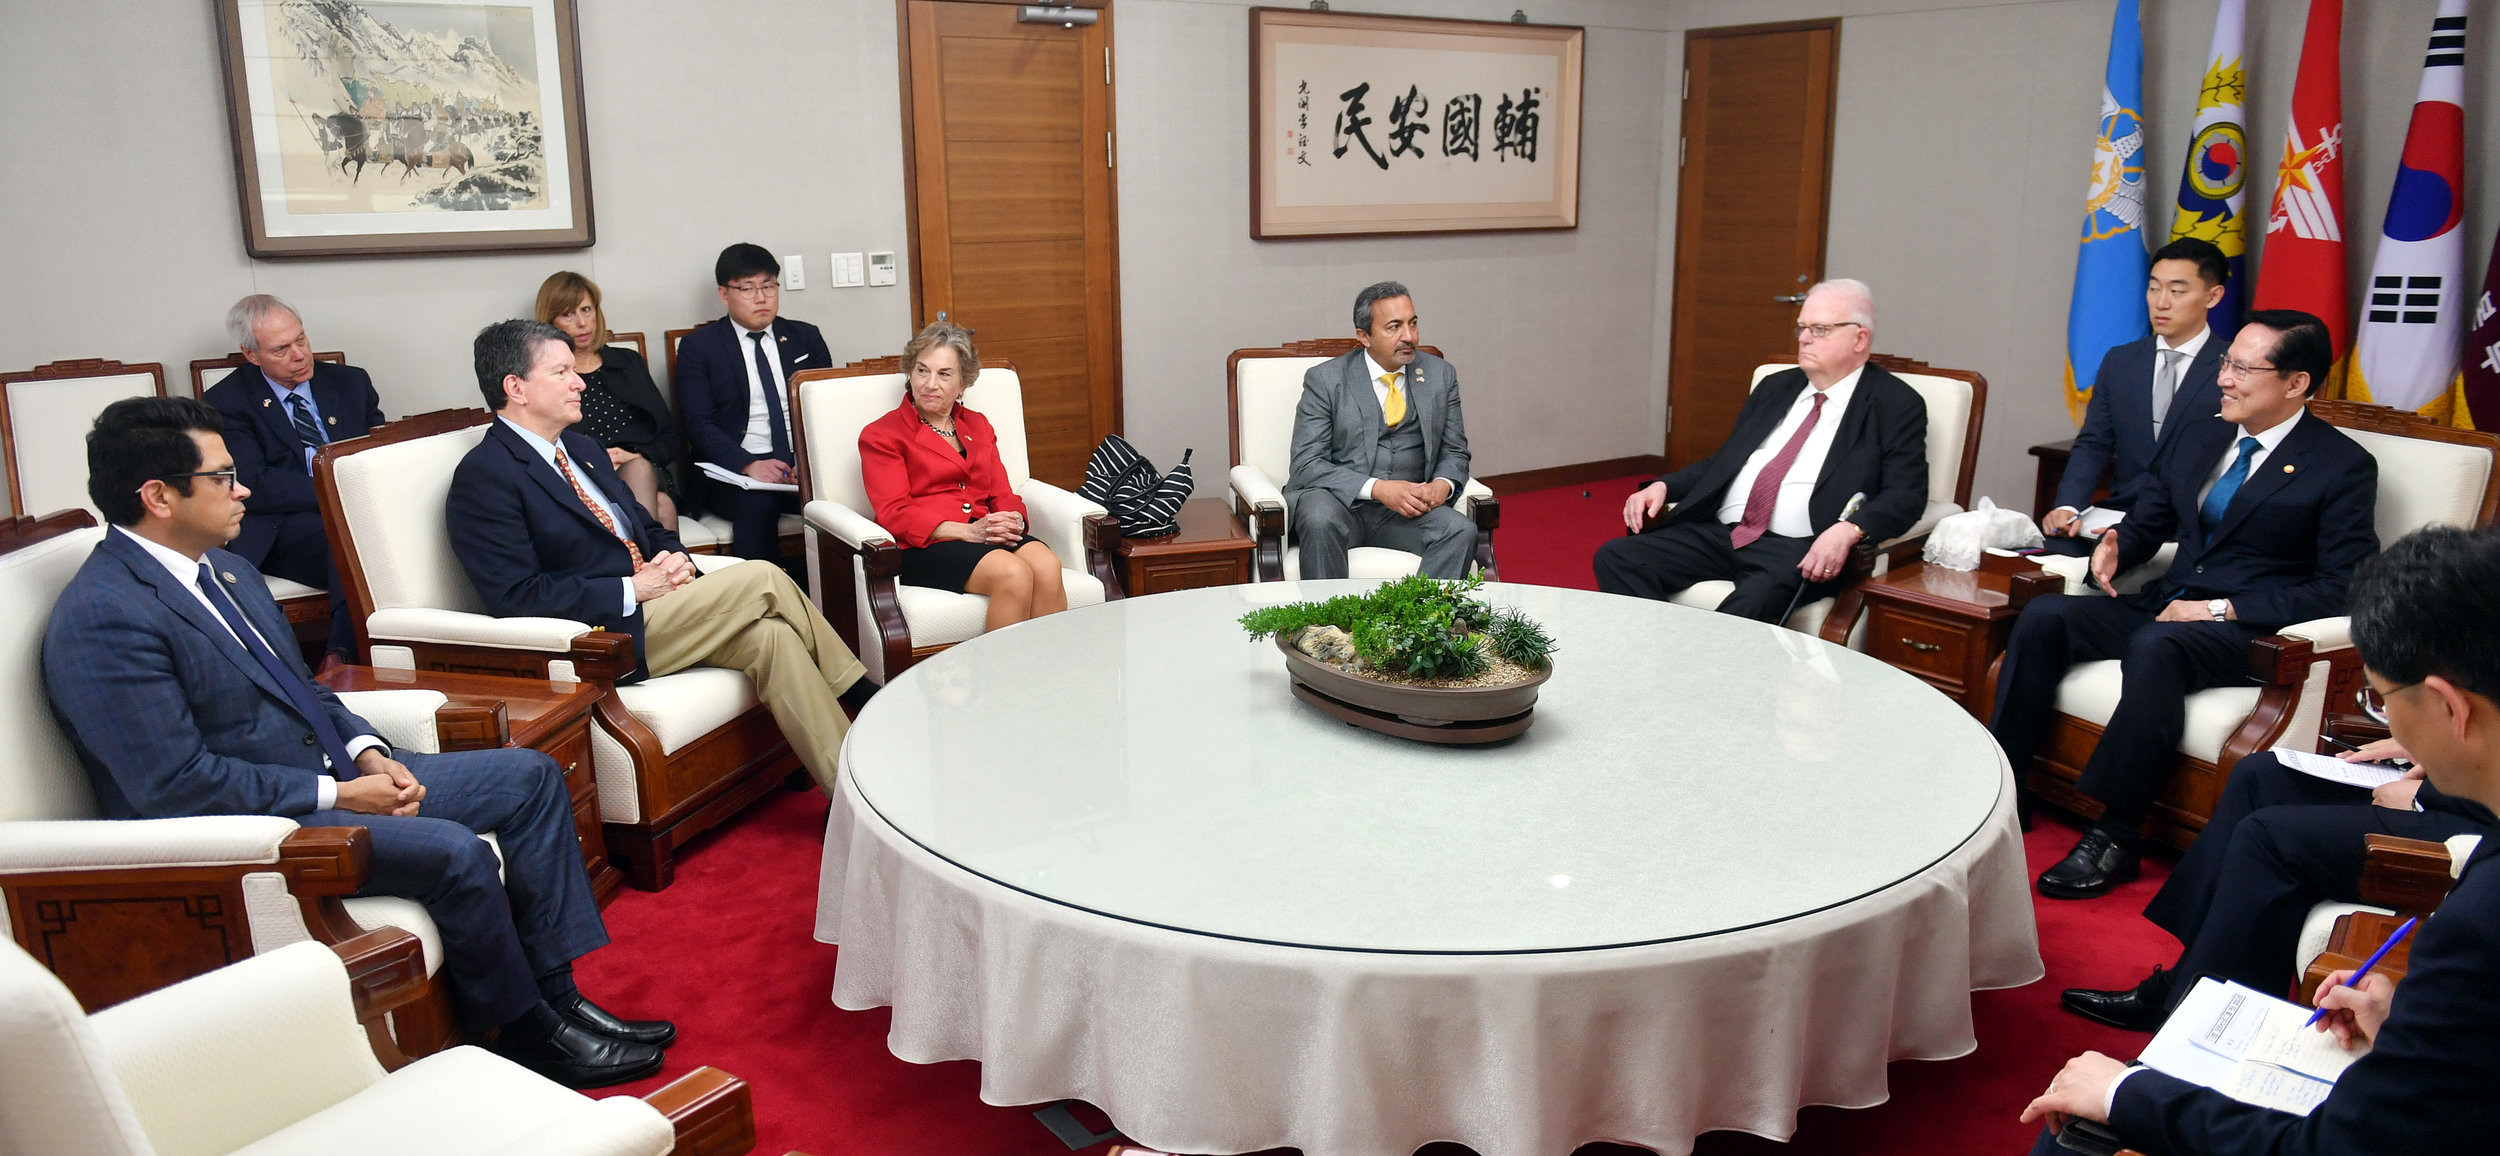 Member of Congress Study Tour of Korea -